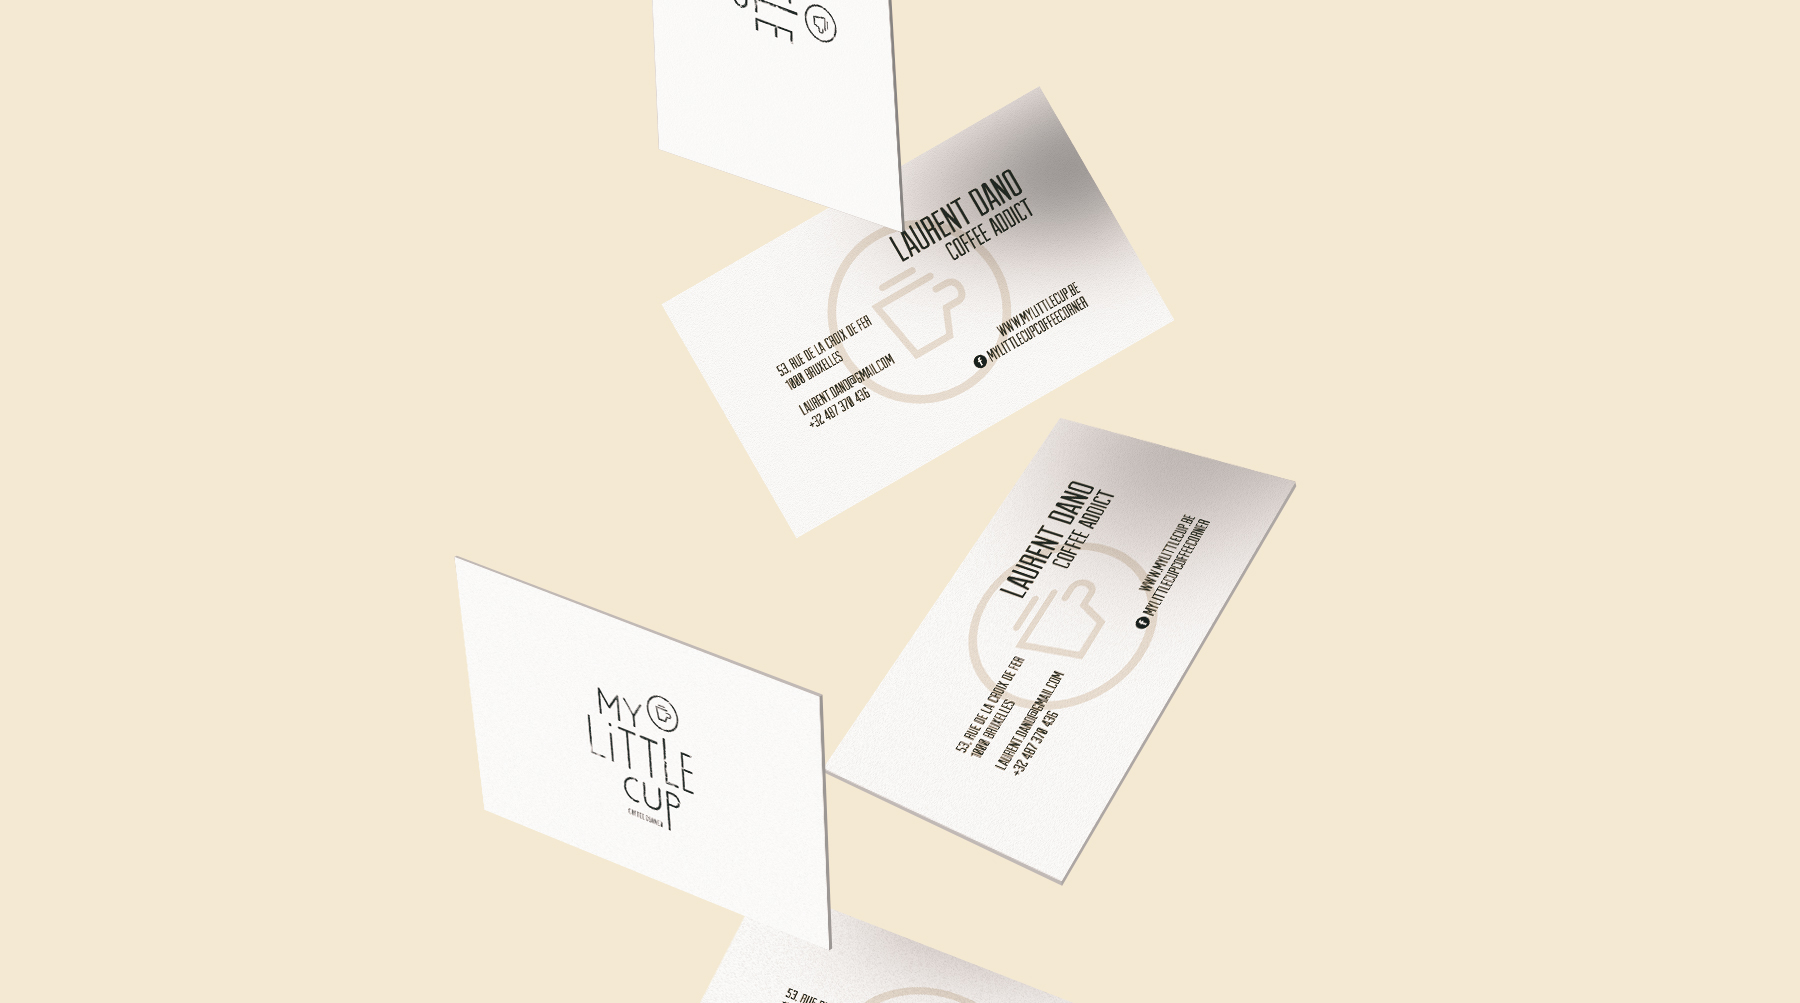 My Little Cup / Coffee Corner / Identity / Art-Director / Logo